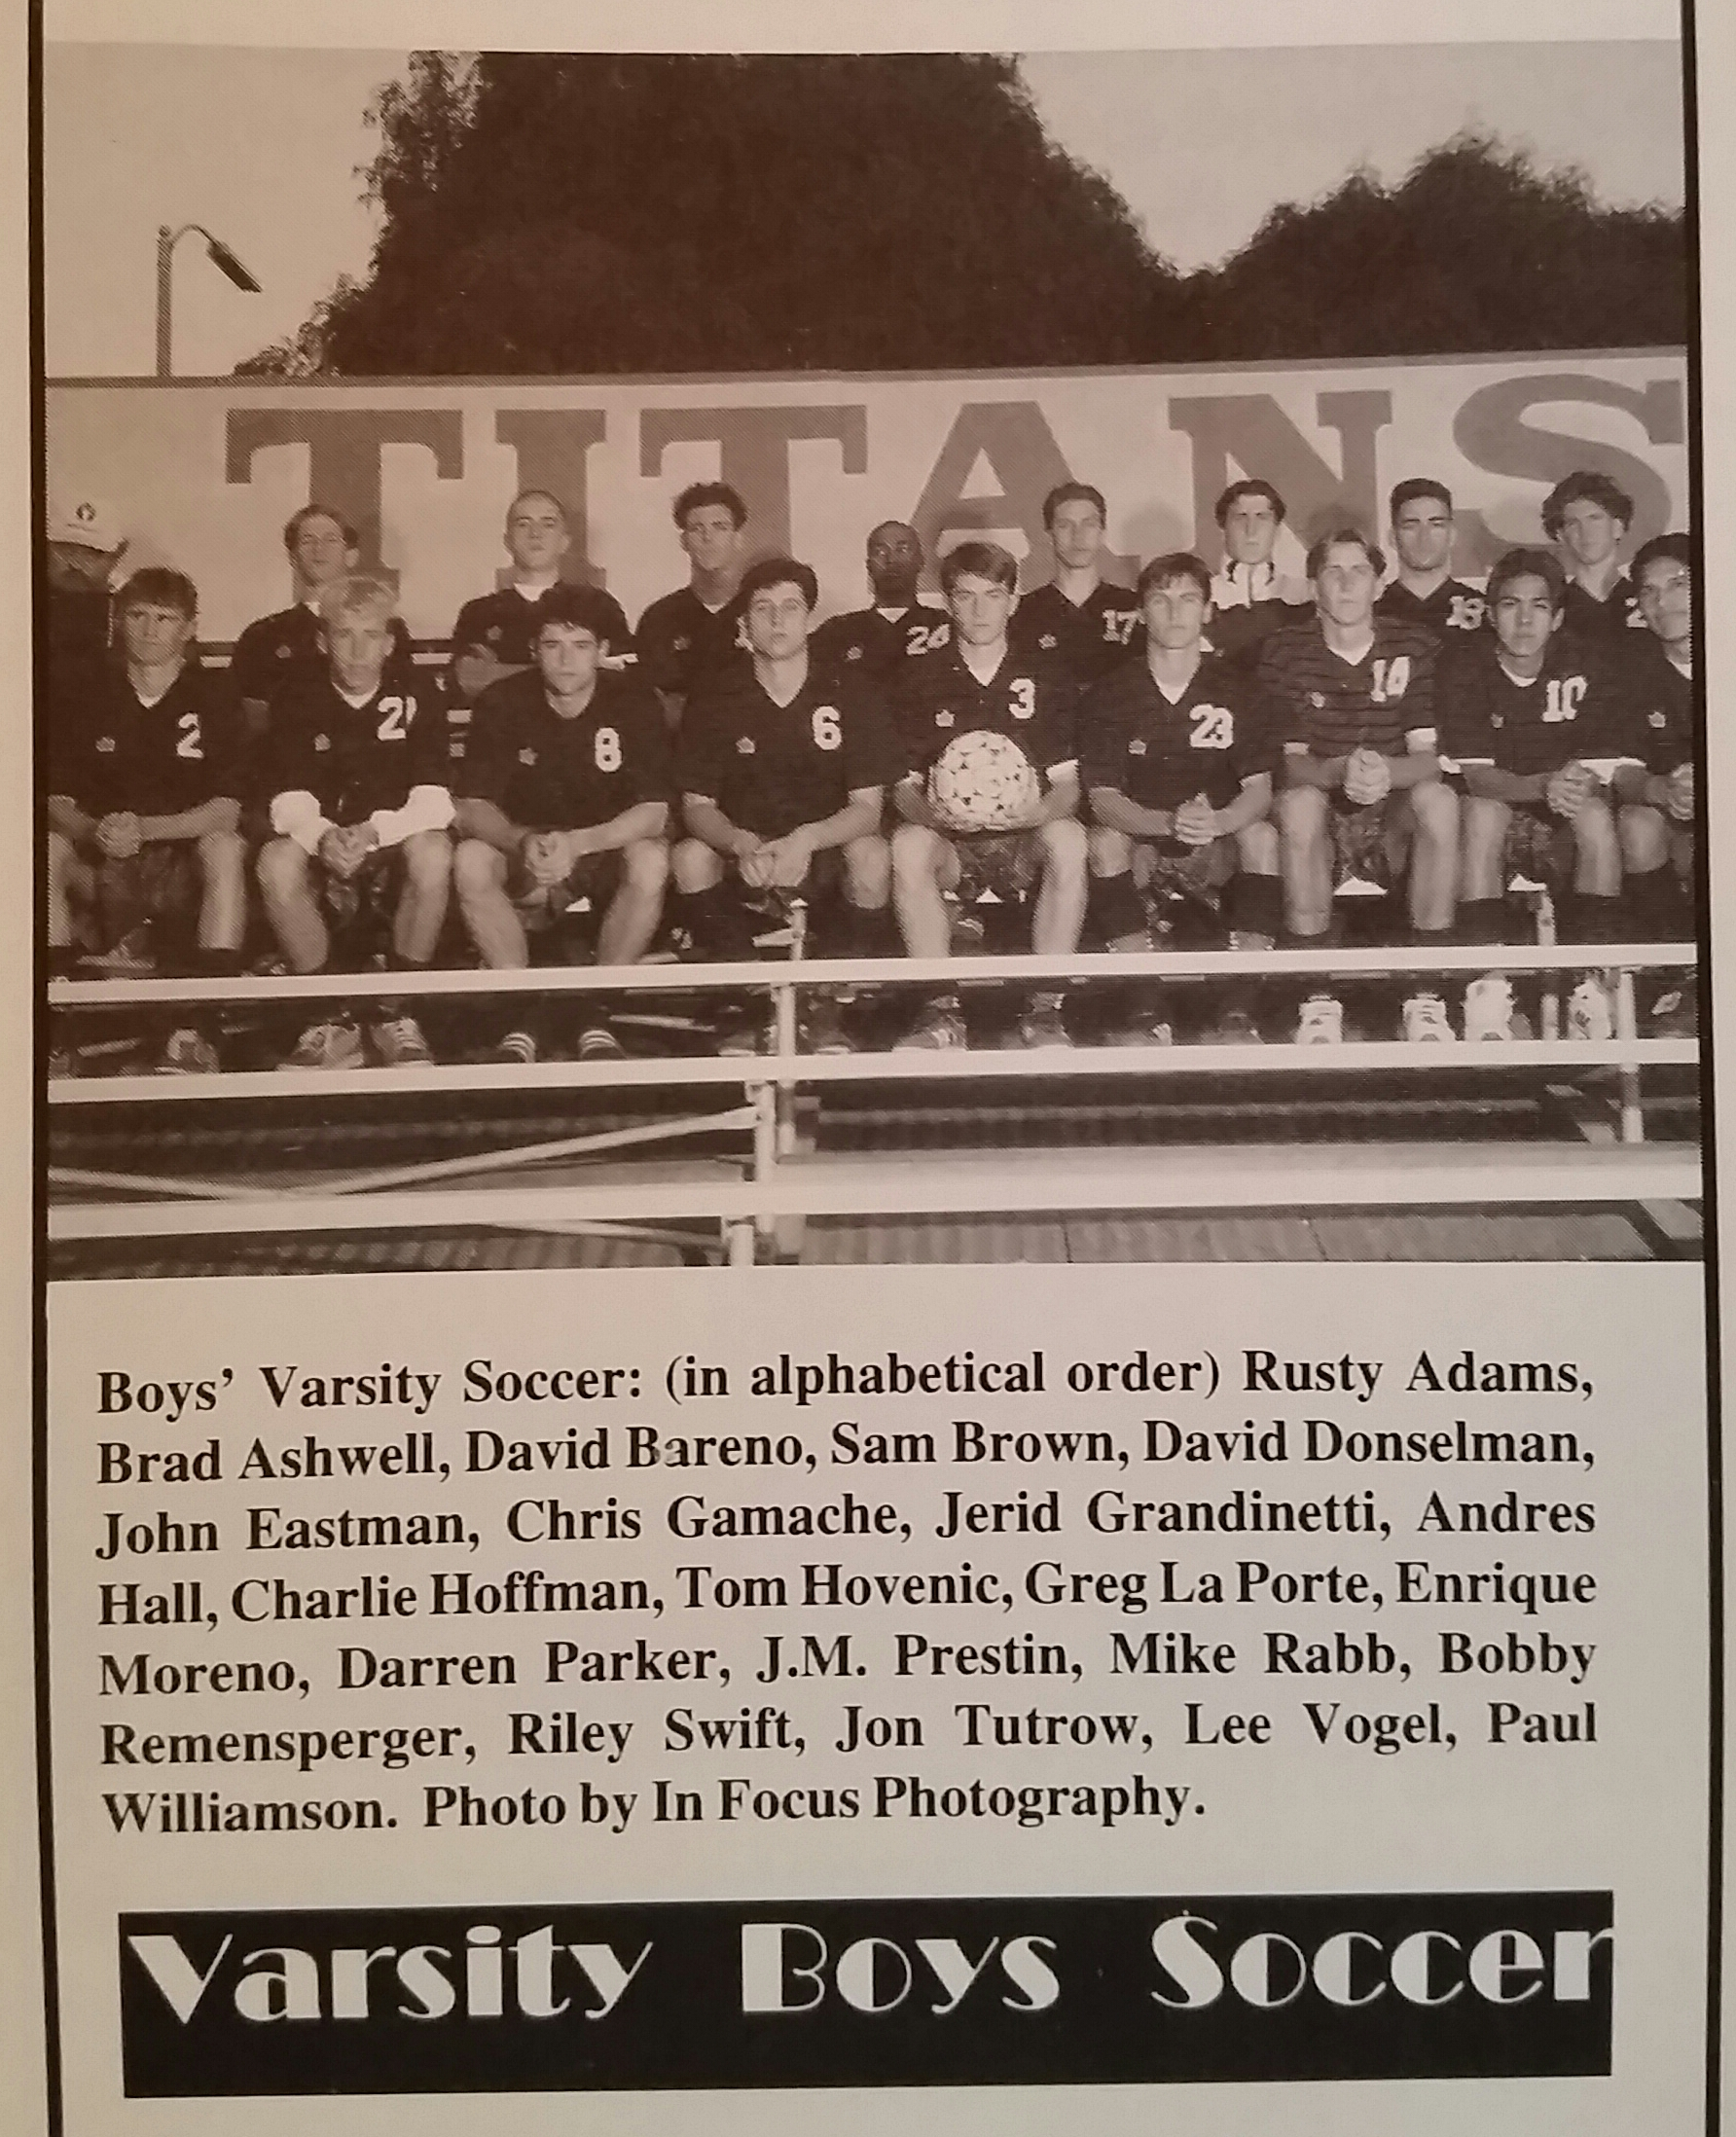 Charley Hoffman - Poway High School Soccer